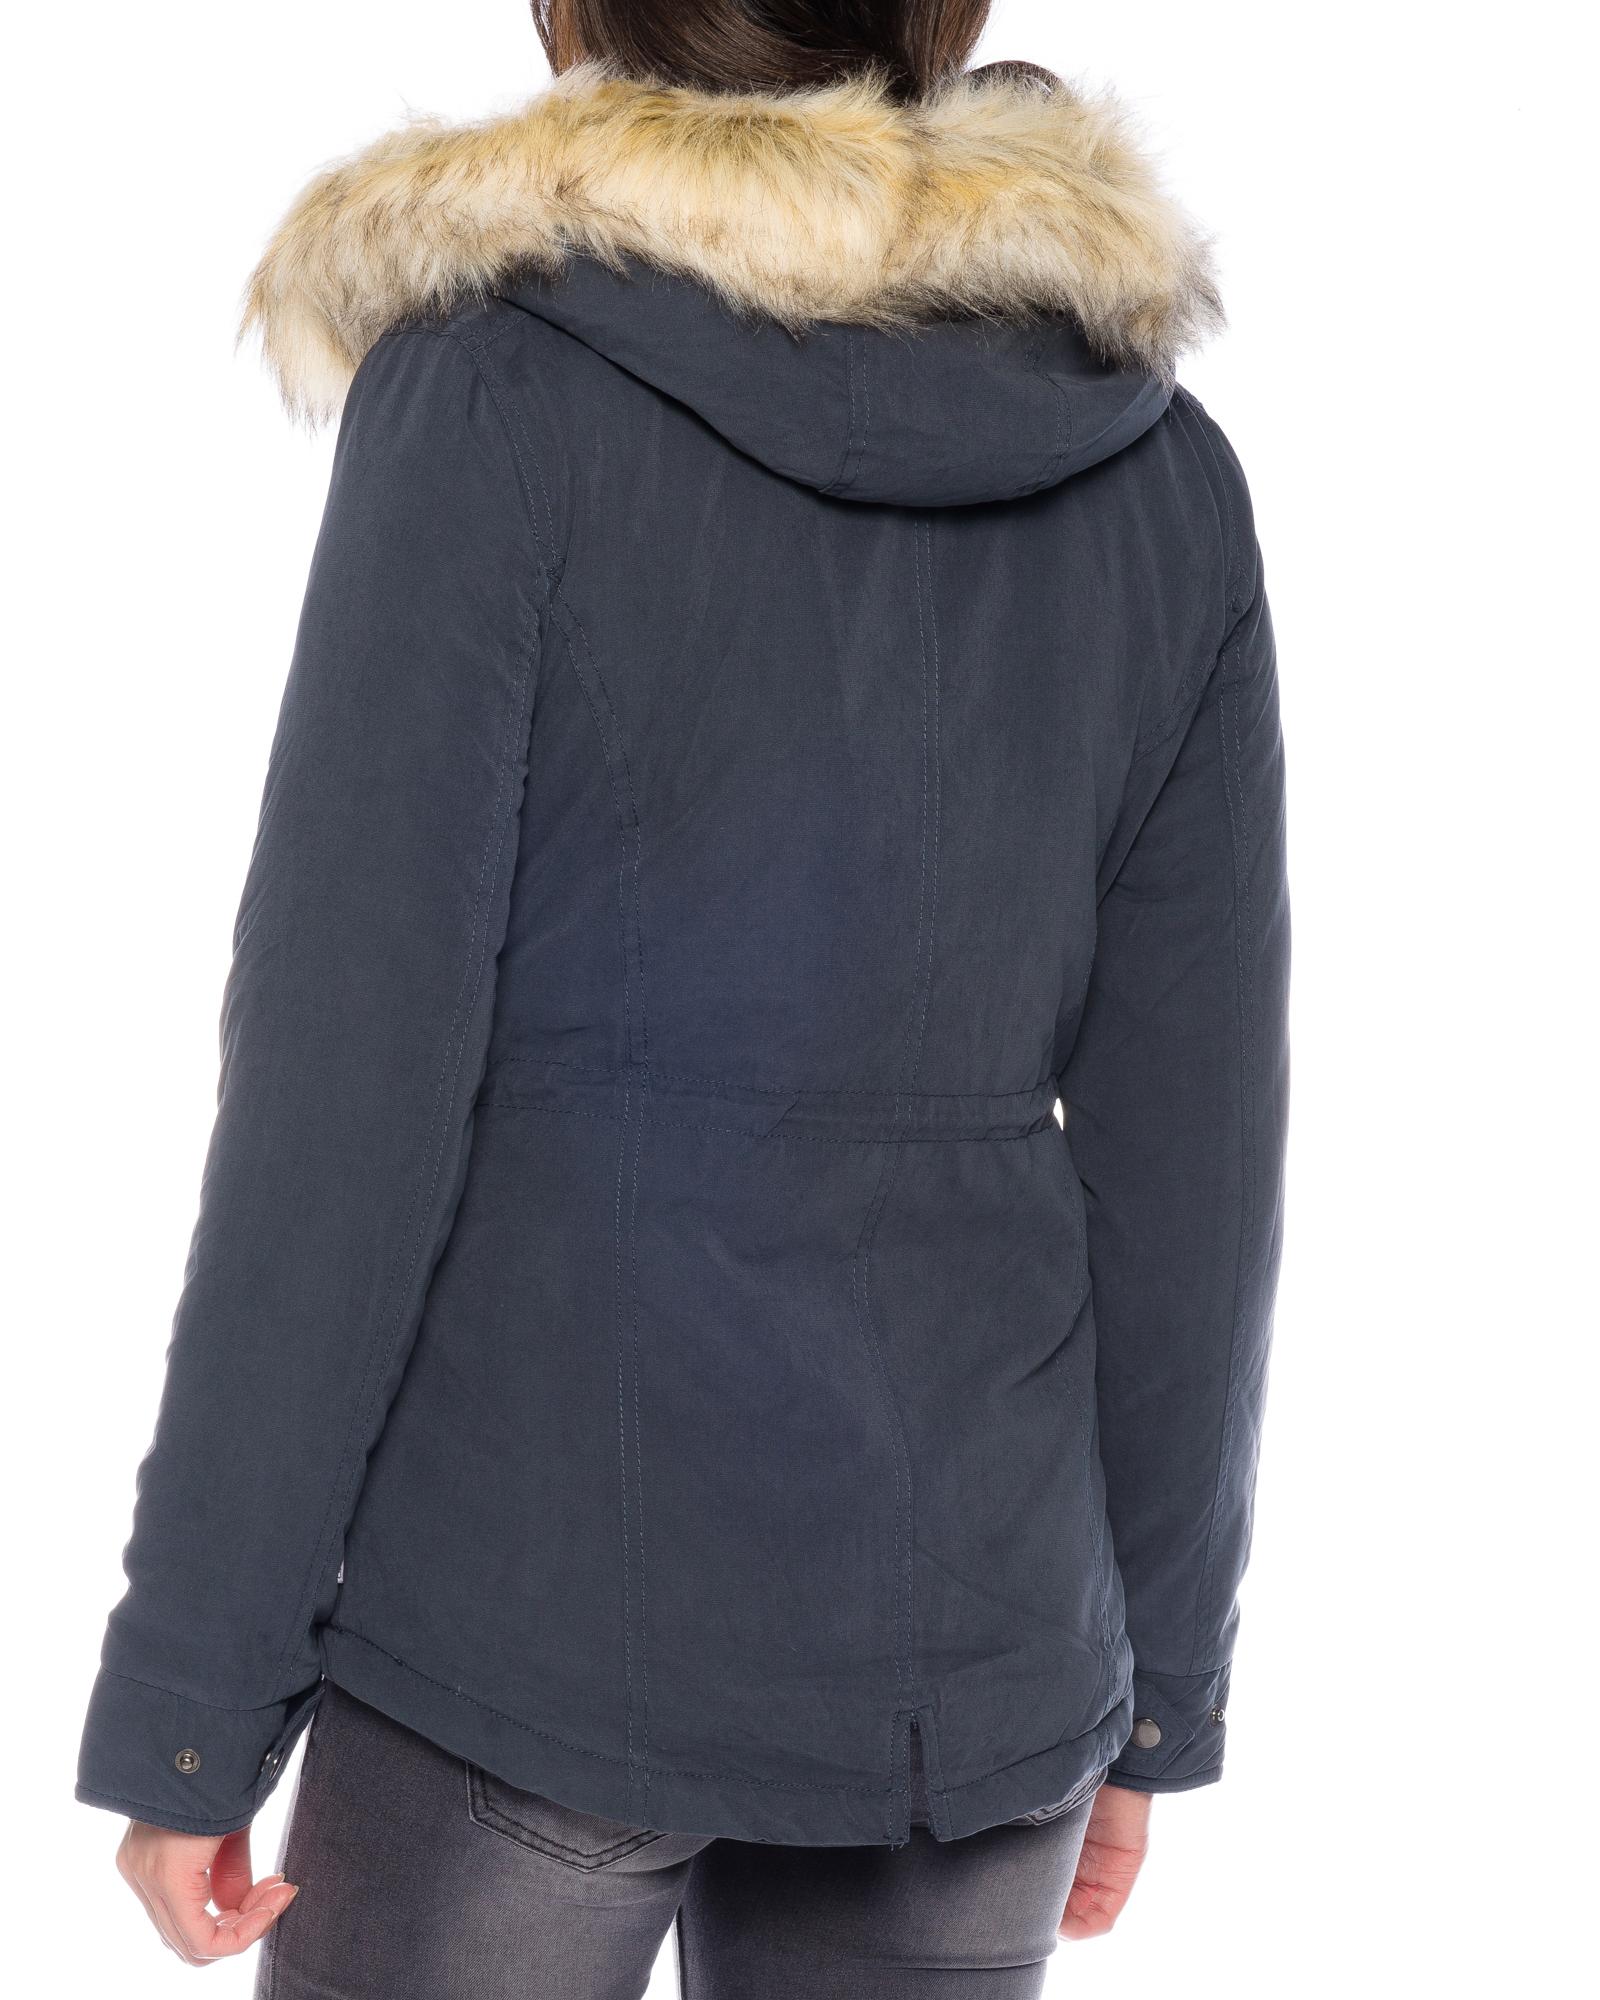 Only Damen Jacke onlNew Lucca Short Parka Jacket 15140879 XS-XL Winter-Mantel